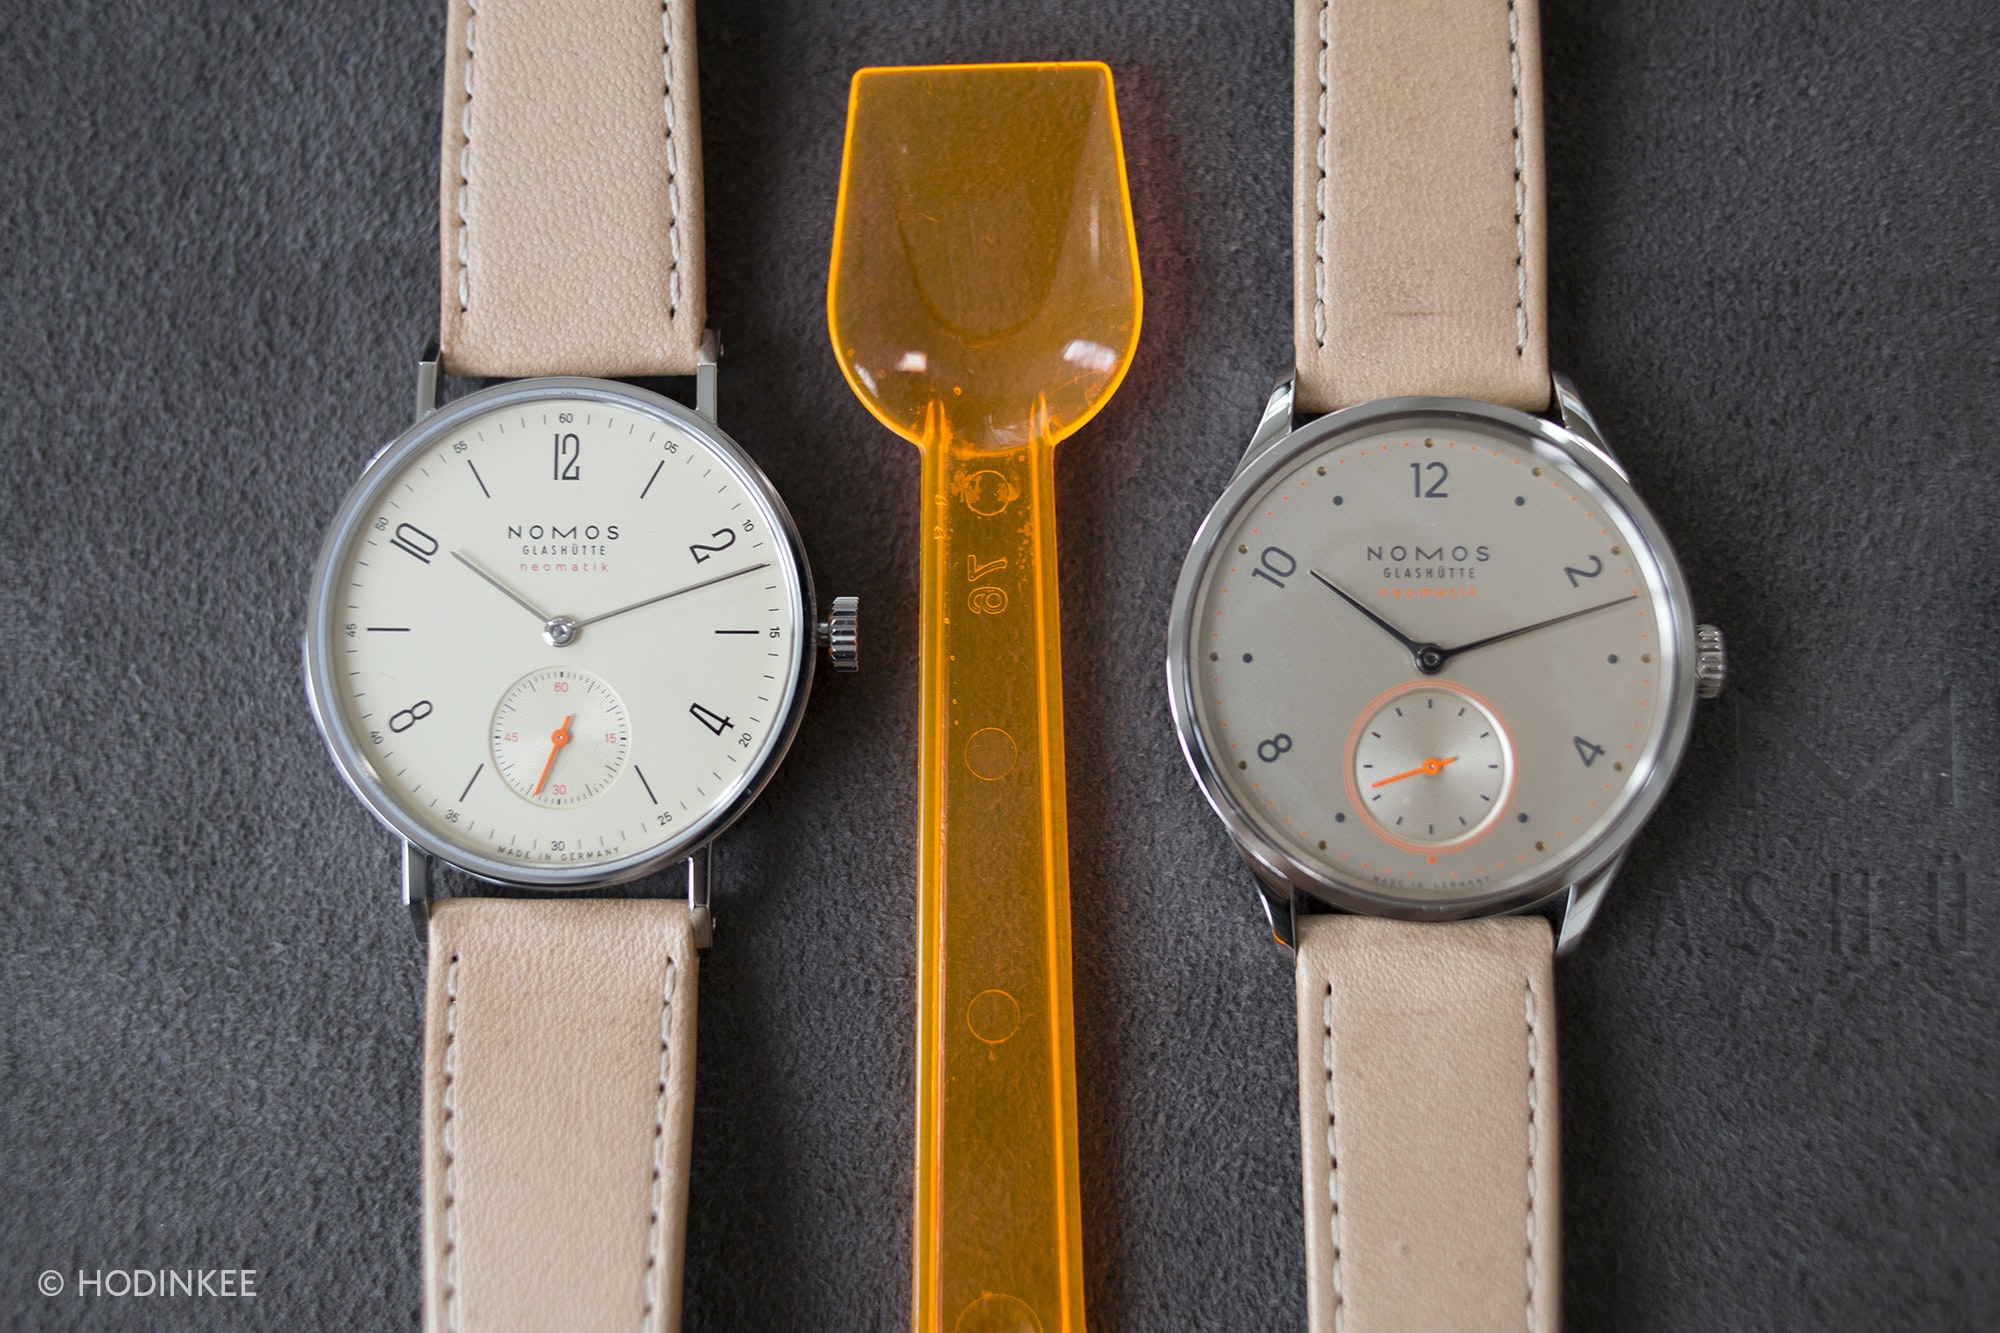 New NOMOS Glashütte Neomatik watches  Inside The Manufacture: A Visit To NOMOS Glashütte, From Design To Production (VIDEO) Inside The Manufacture: A Visit To NOMOS Glashütte, From Design To Production (VIDEO) 588A8665 copy